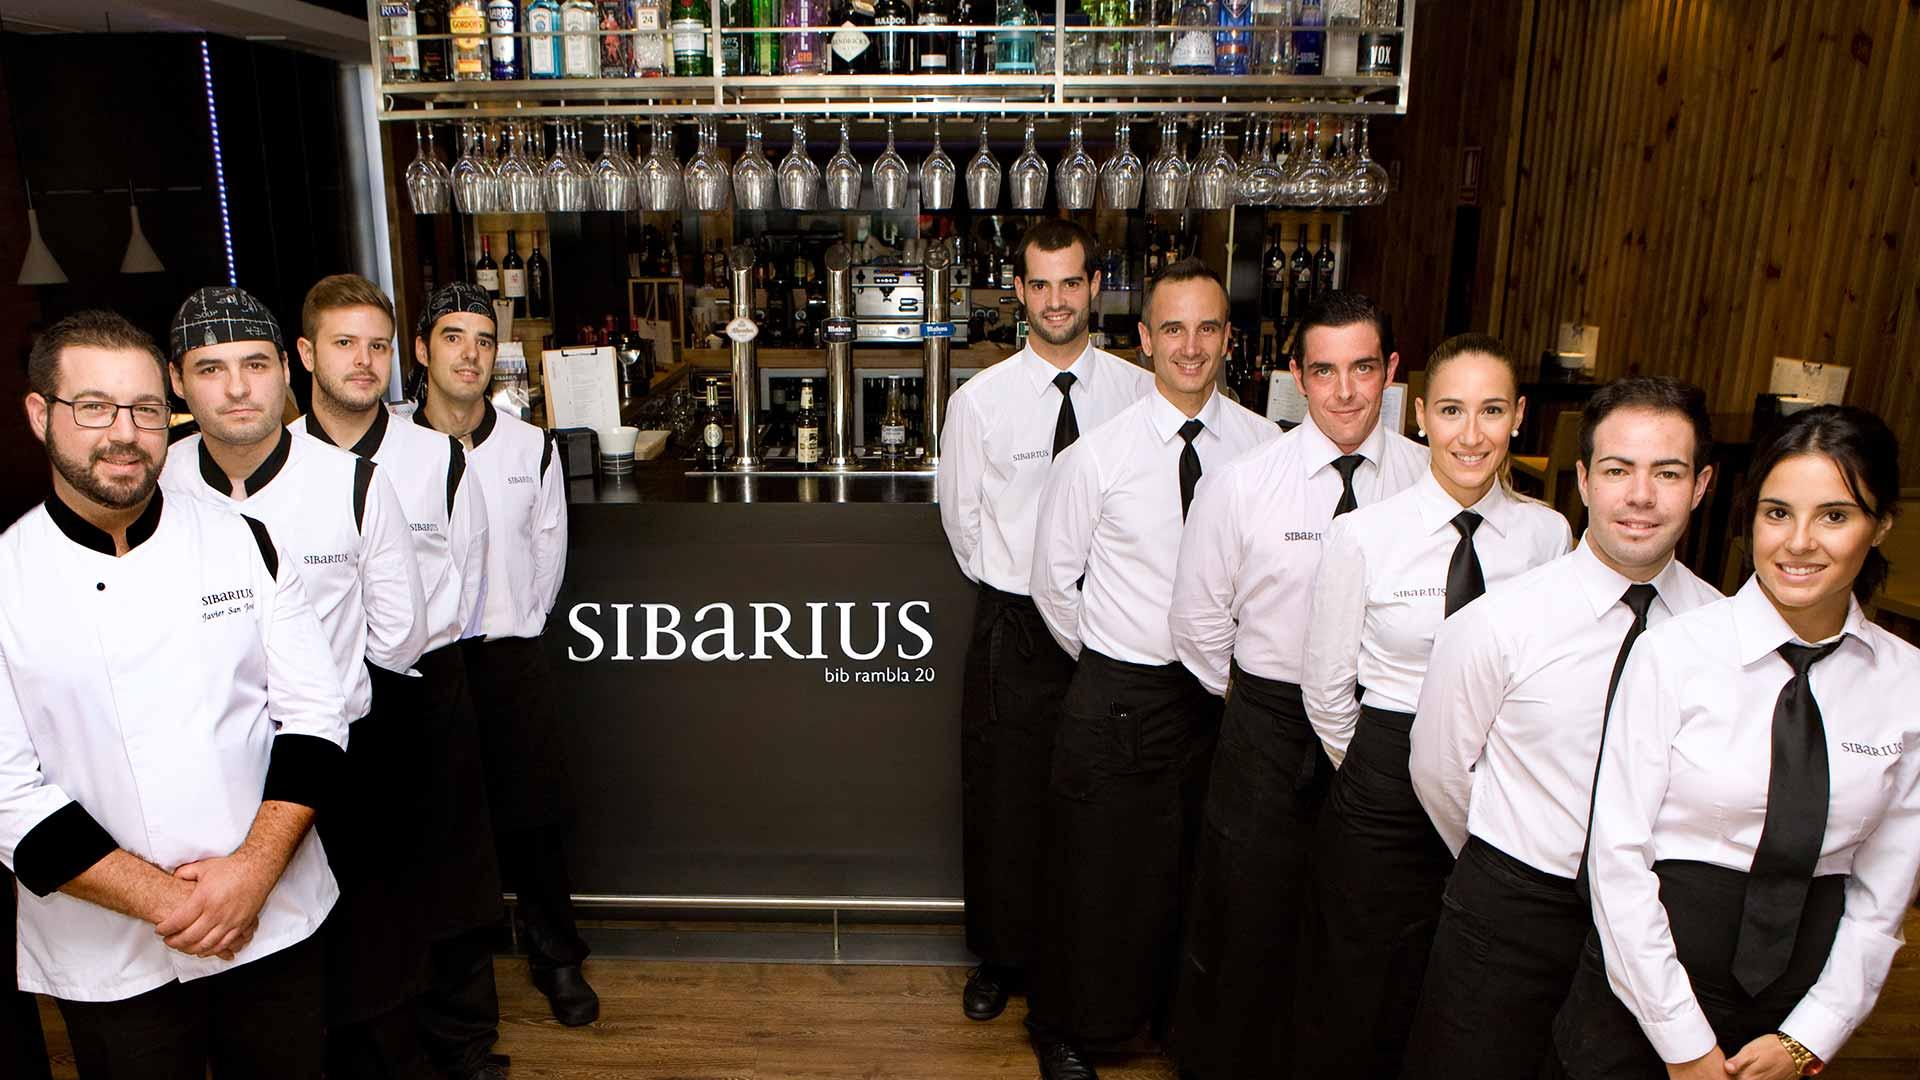 Equipo Sibarius Grupo Sibarius